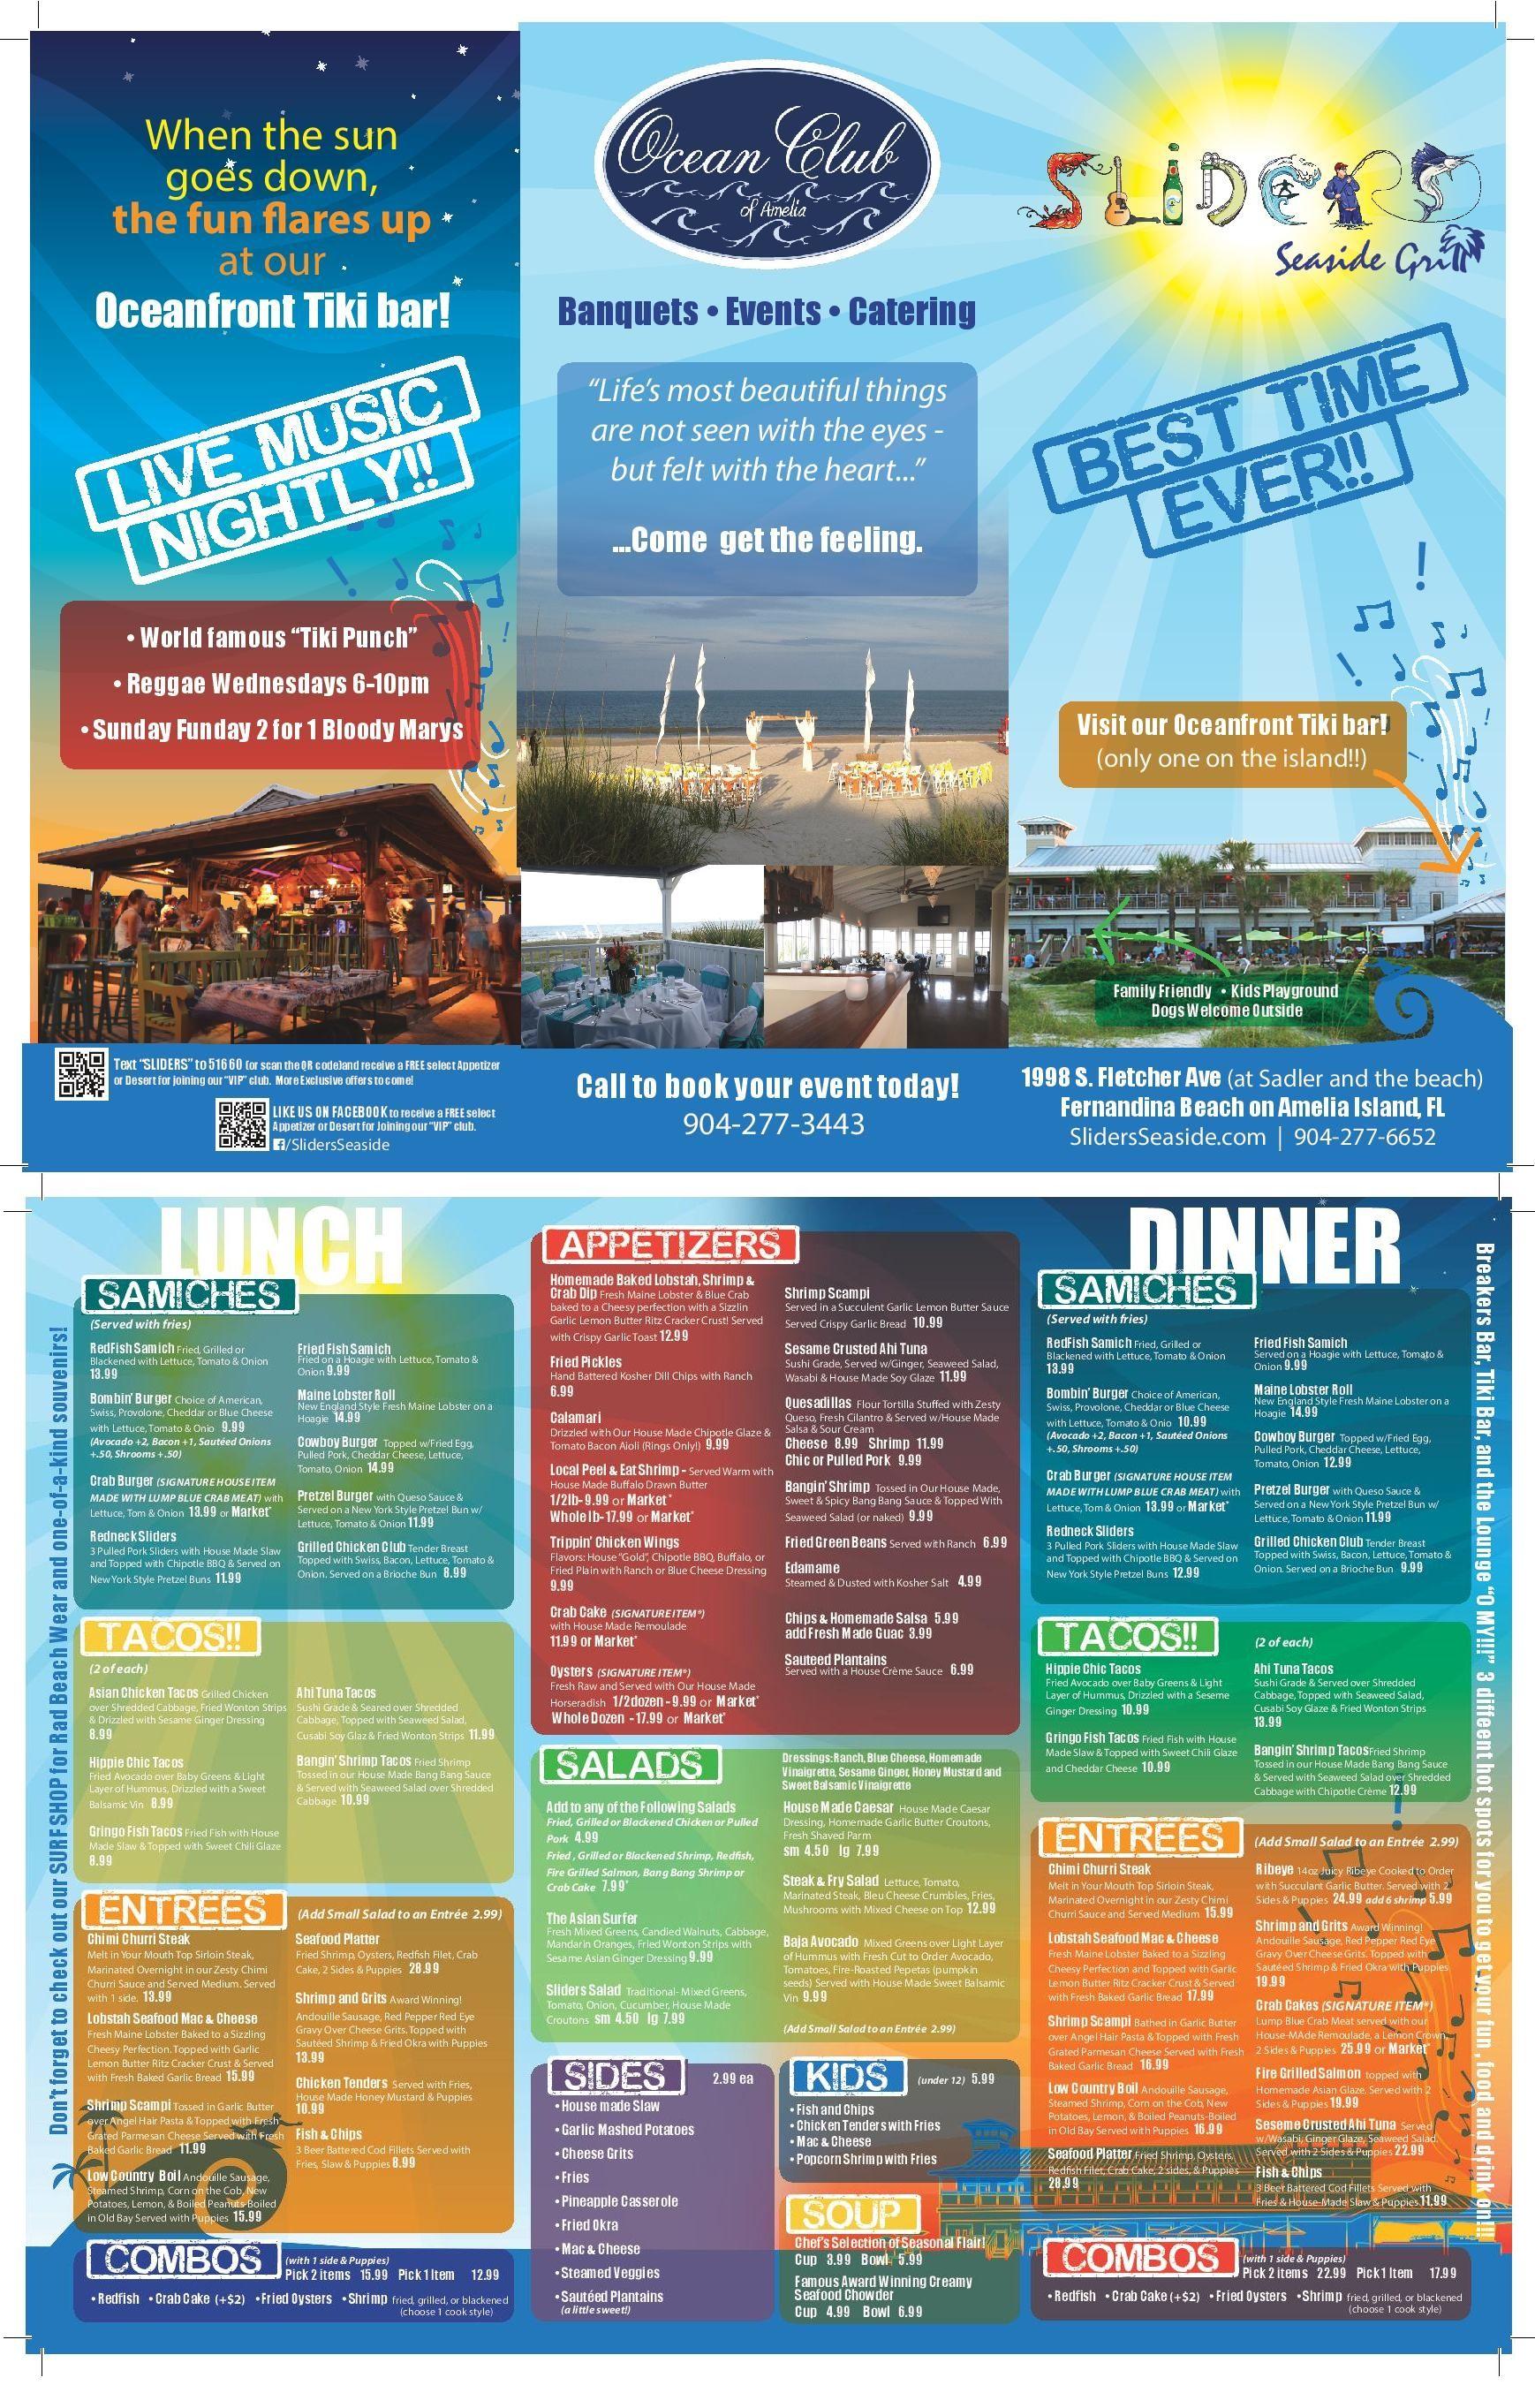 Sliders Seaside Grill - Lunch Menu | amelia island | Pinterest ...